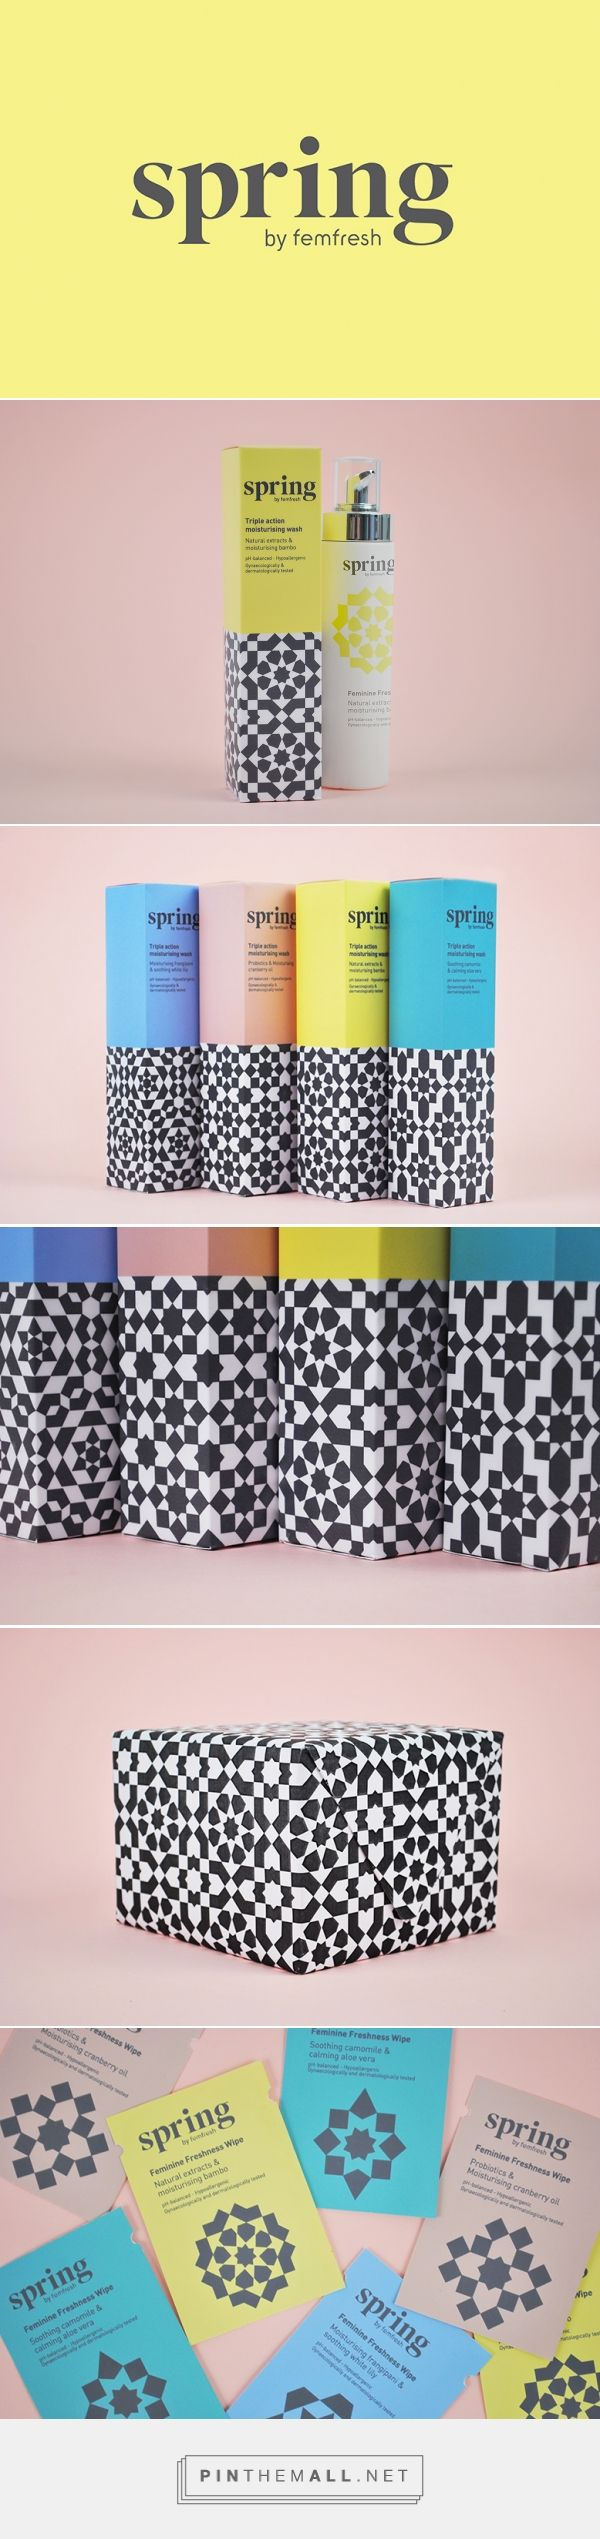 YCN Femfresh Feminine Body Care Packaging by Eve Warren | Fivestar Branding Agency – Design and Branding Agency & Curated Inspiration Gallery